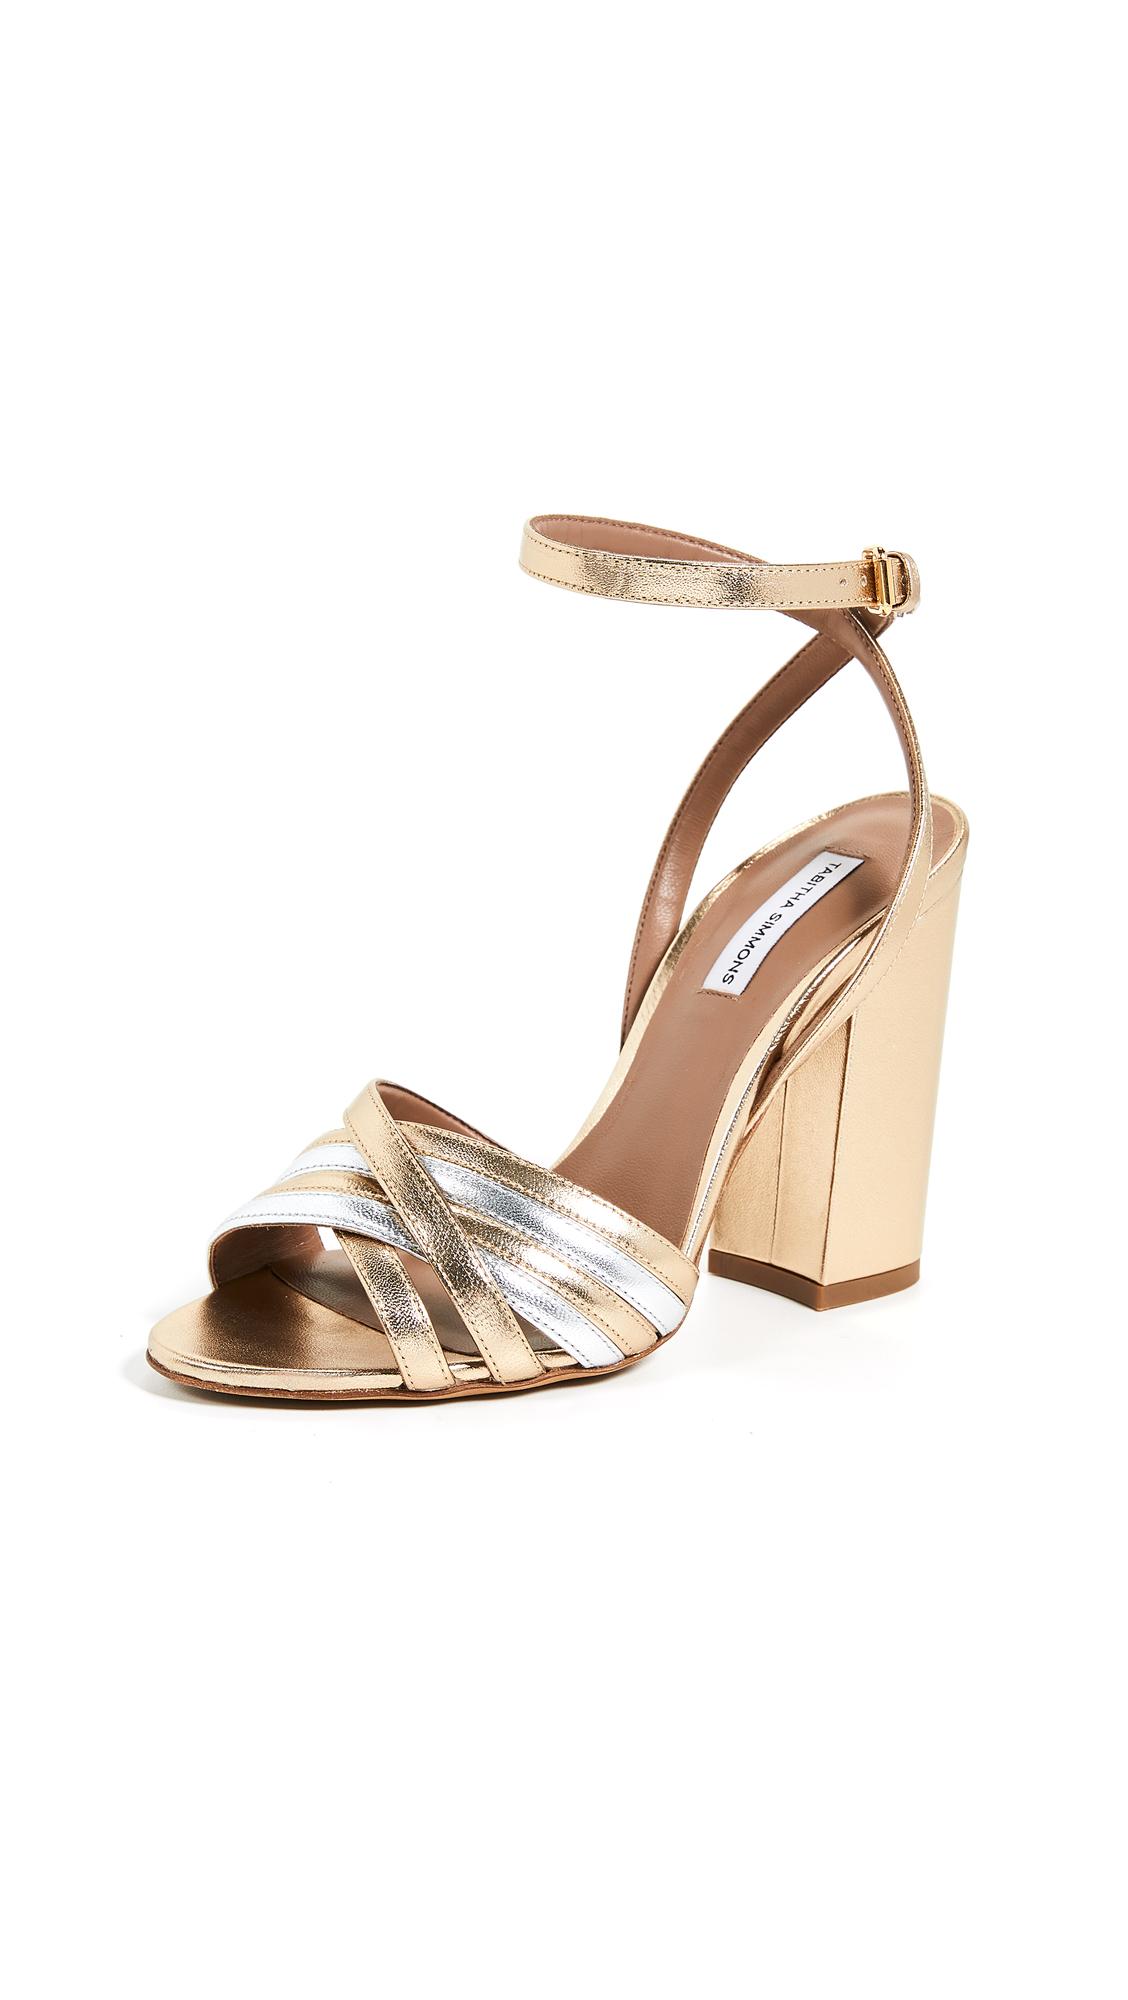 Tabitha Simmons Toni Sandals - Gold/Silver